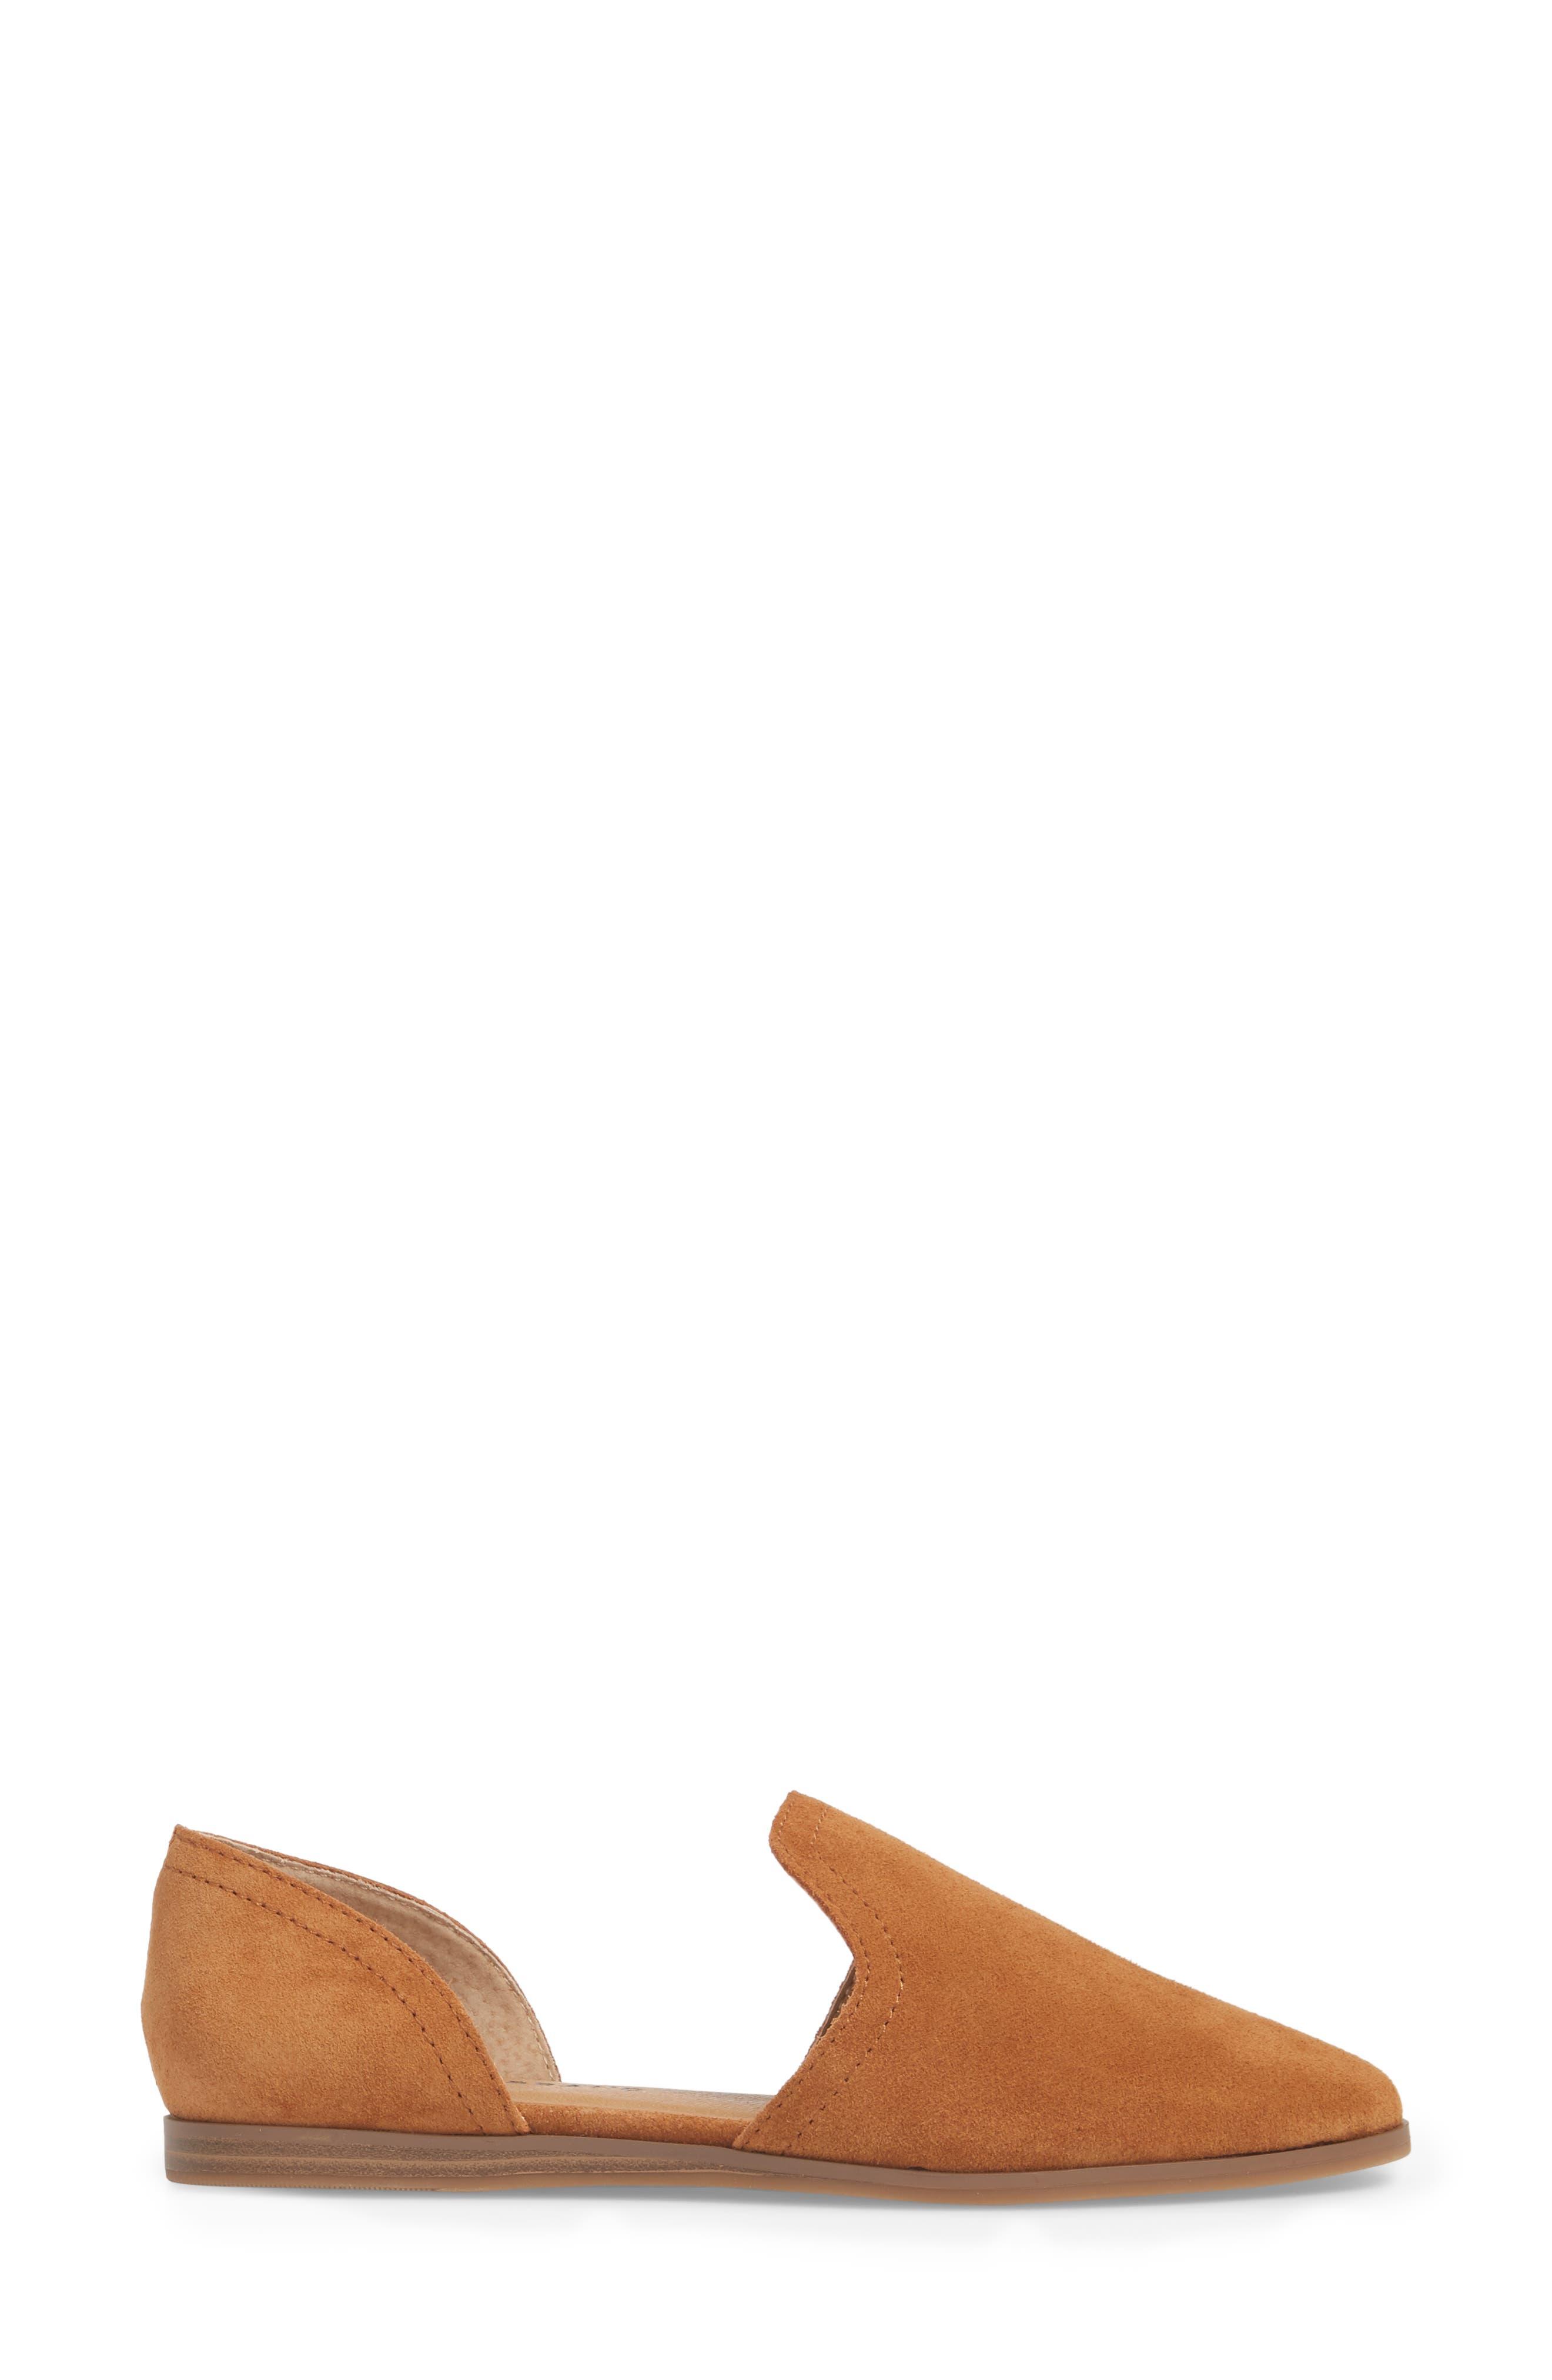 Jinree Flat,                             Alternate thumbnail 3, color,                             MACAROON SUEDE